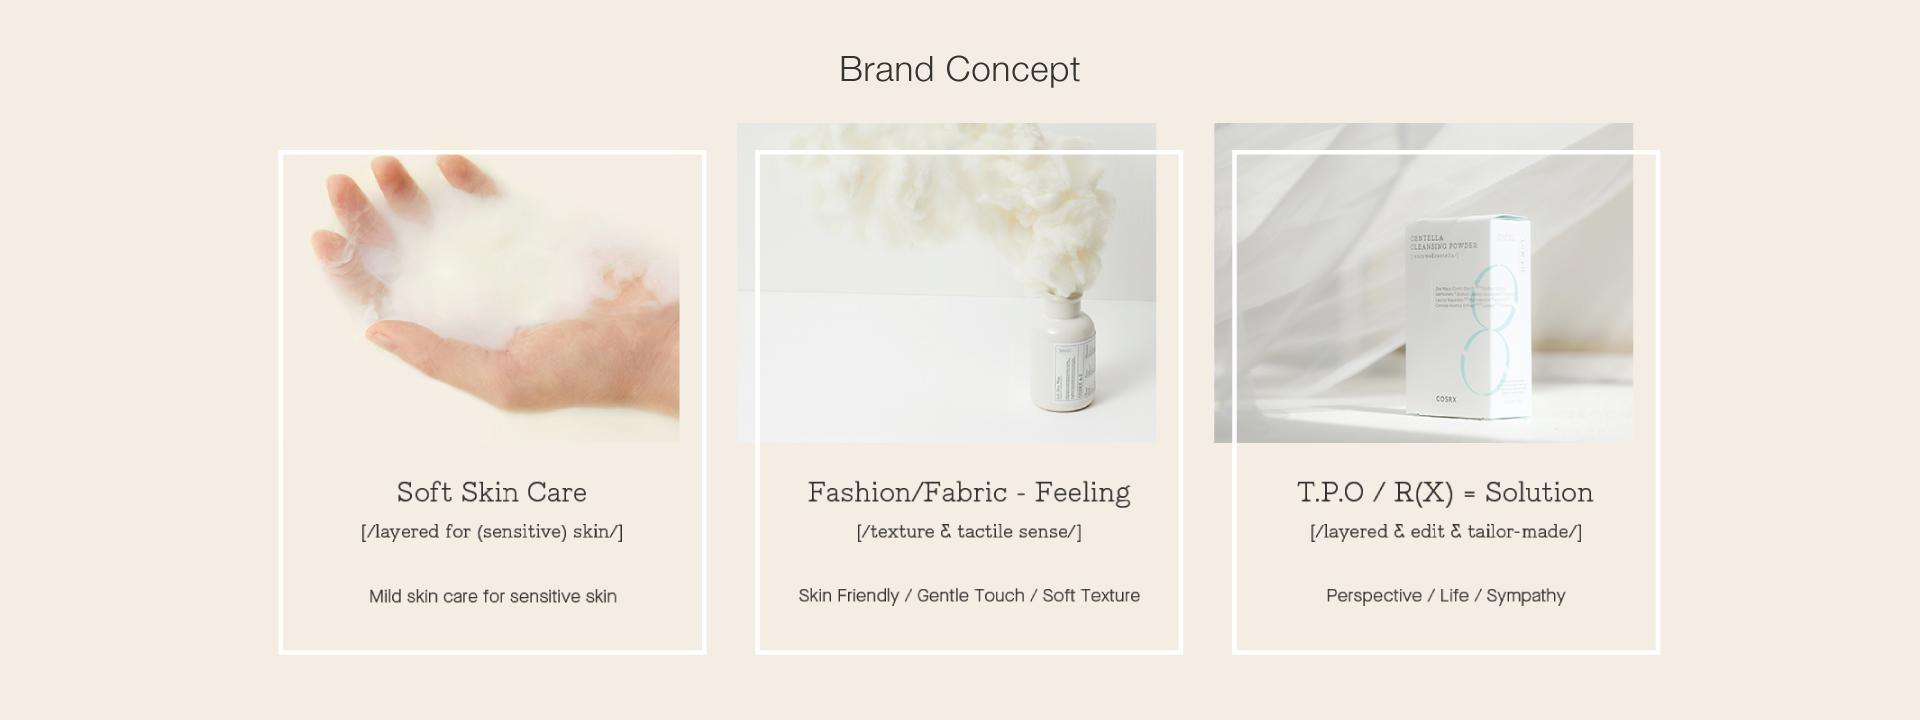 Cosrx Flagship Brand Concept